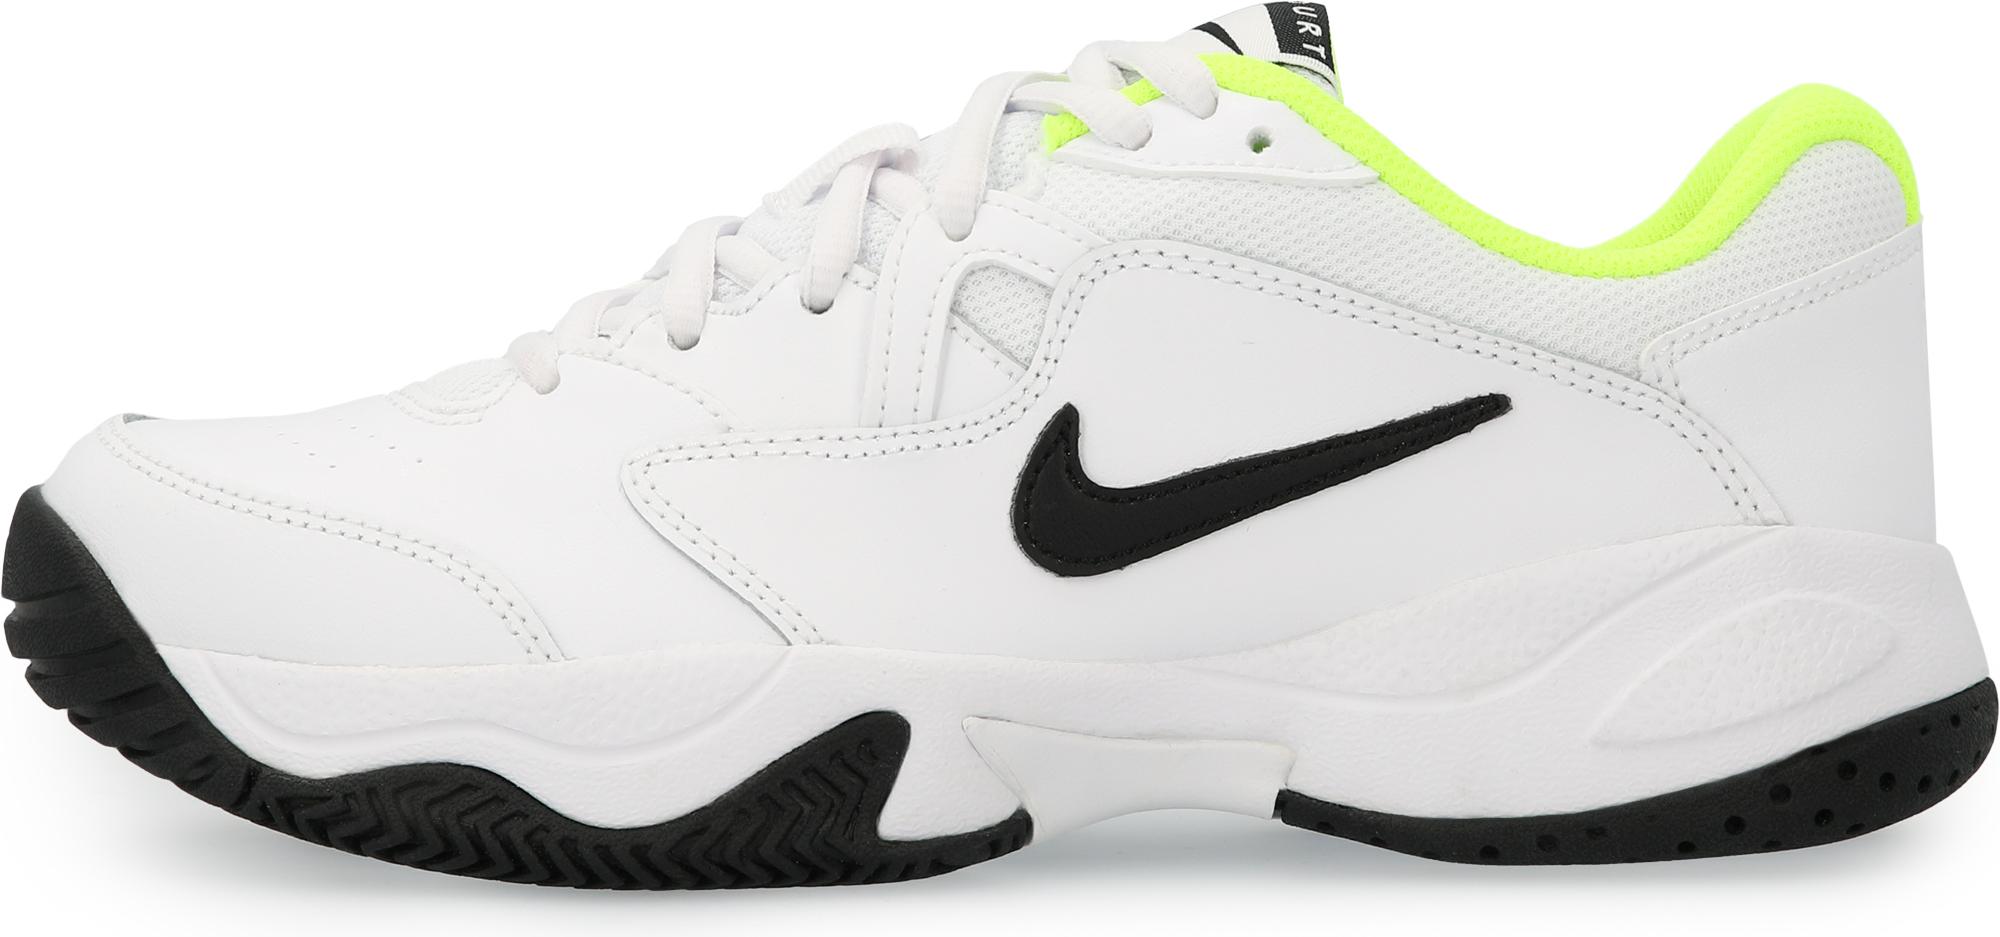 Nike Кроссовки детские Nike Court Lite 2, размер 35 кроссовки детские nike цвет синий